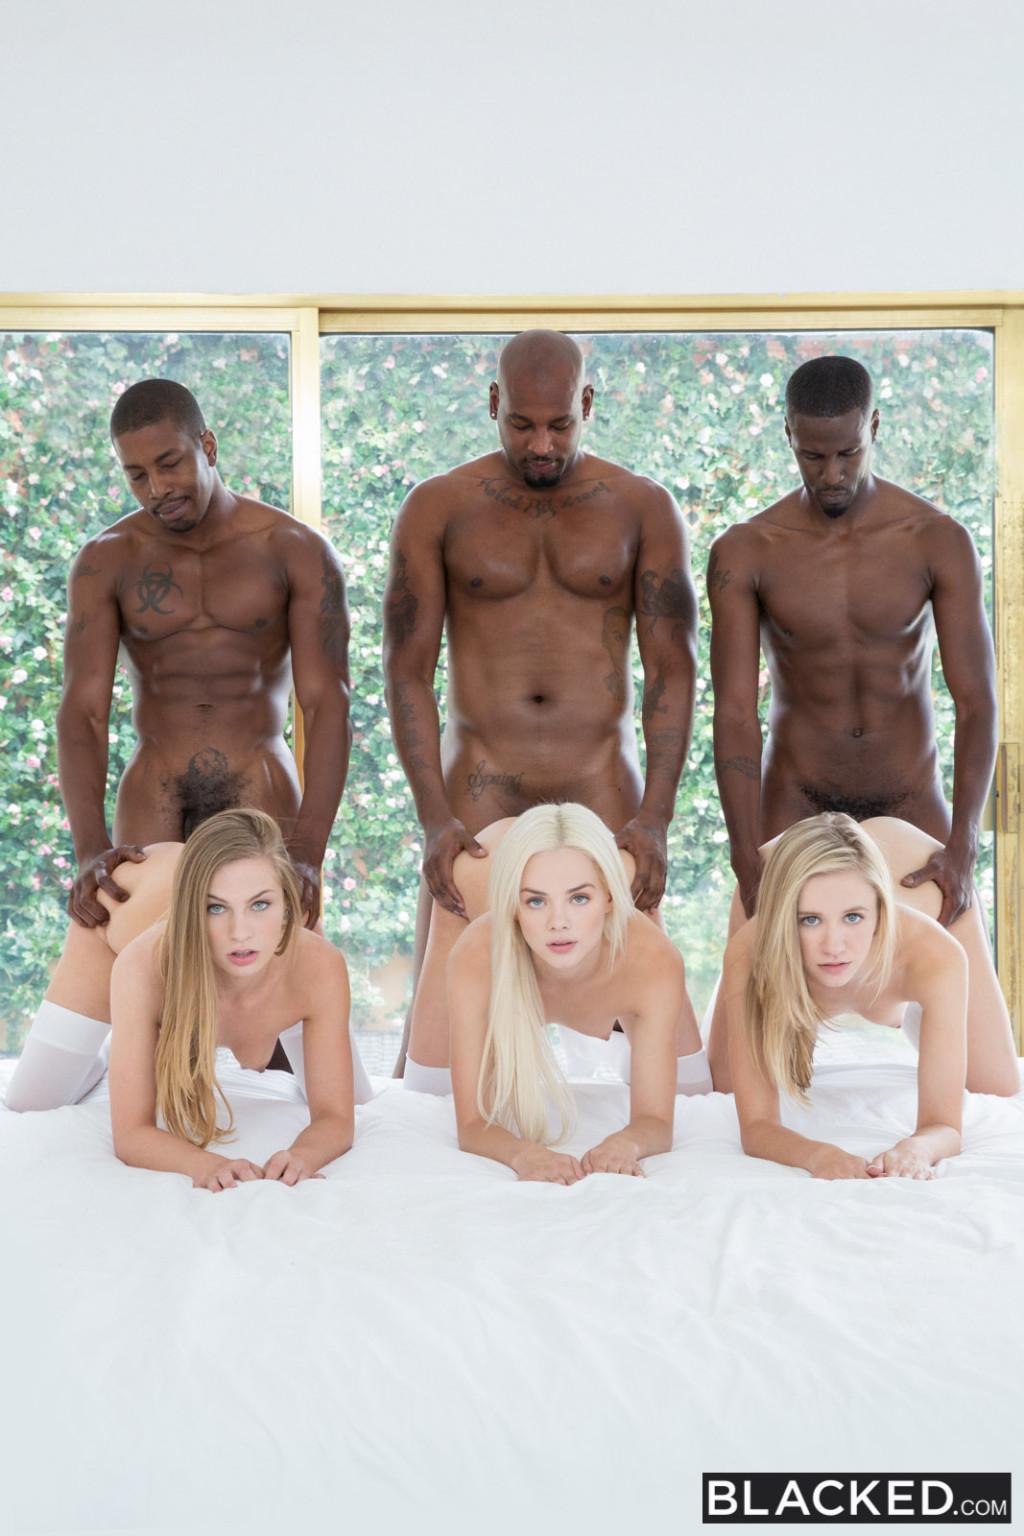 Realstolen images of amateur girls nude